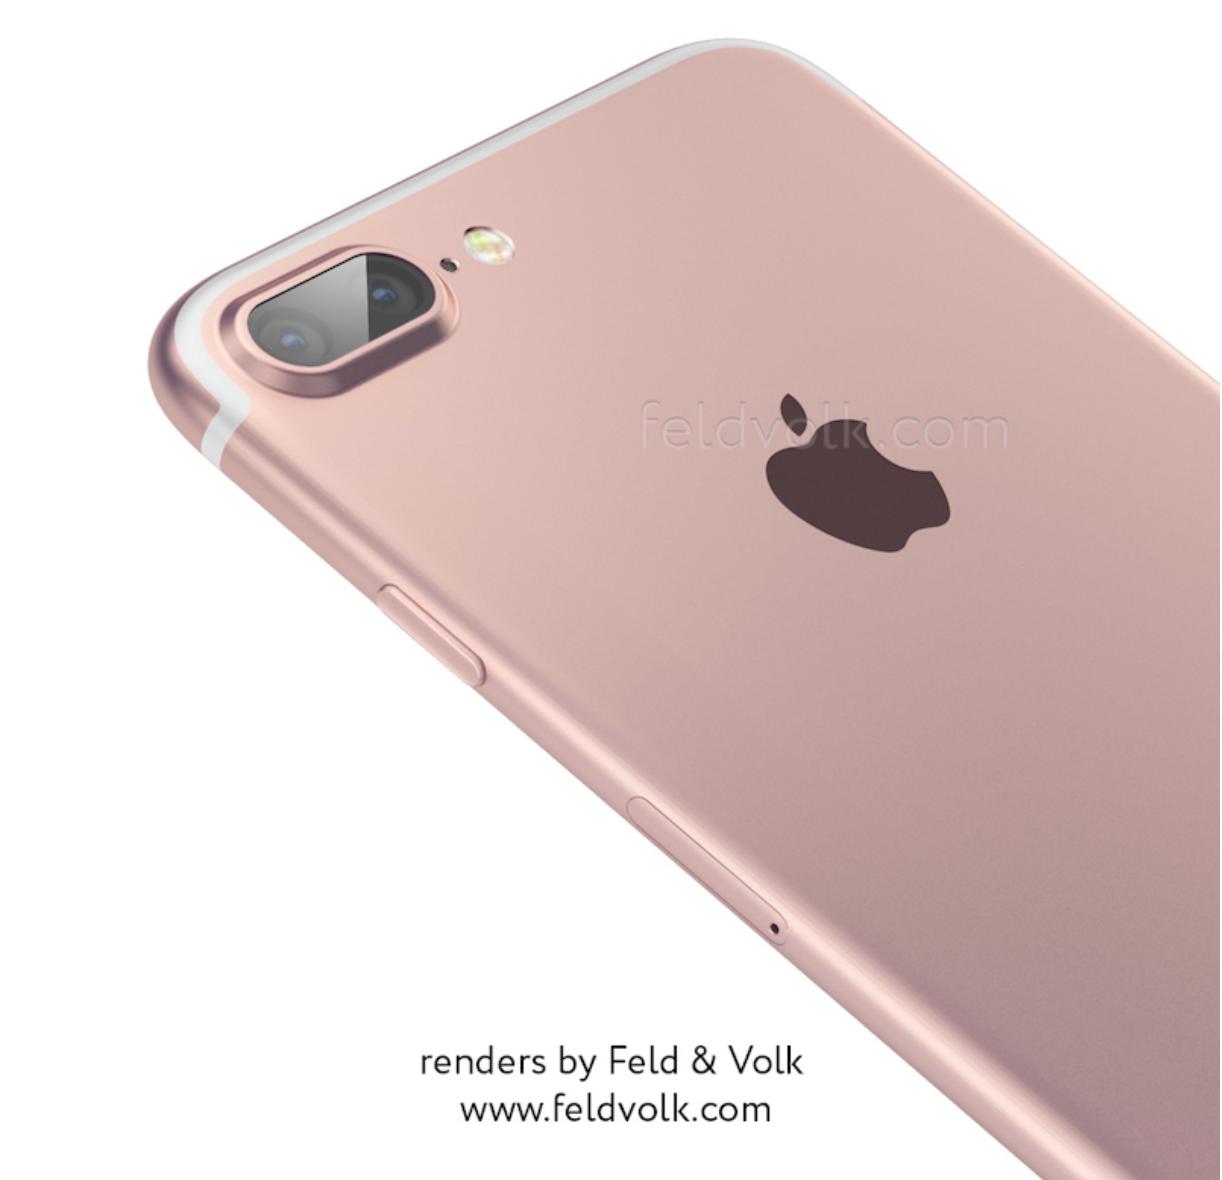 iphone7_plus-cad_image_by_feldvolk1